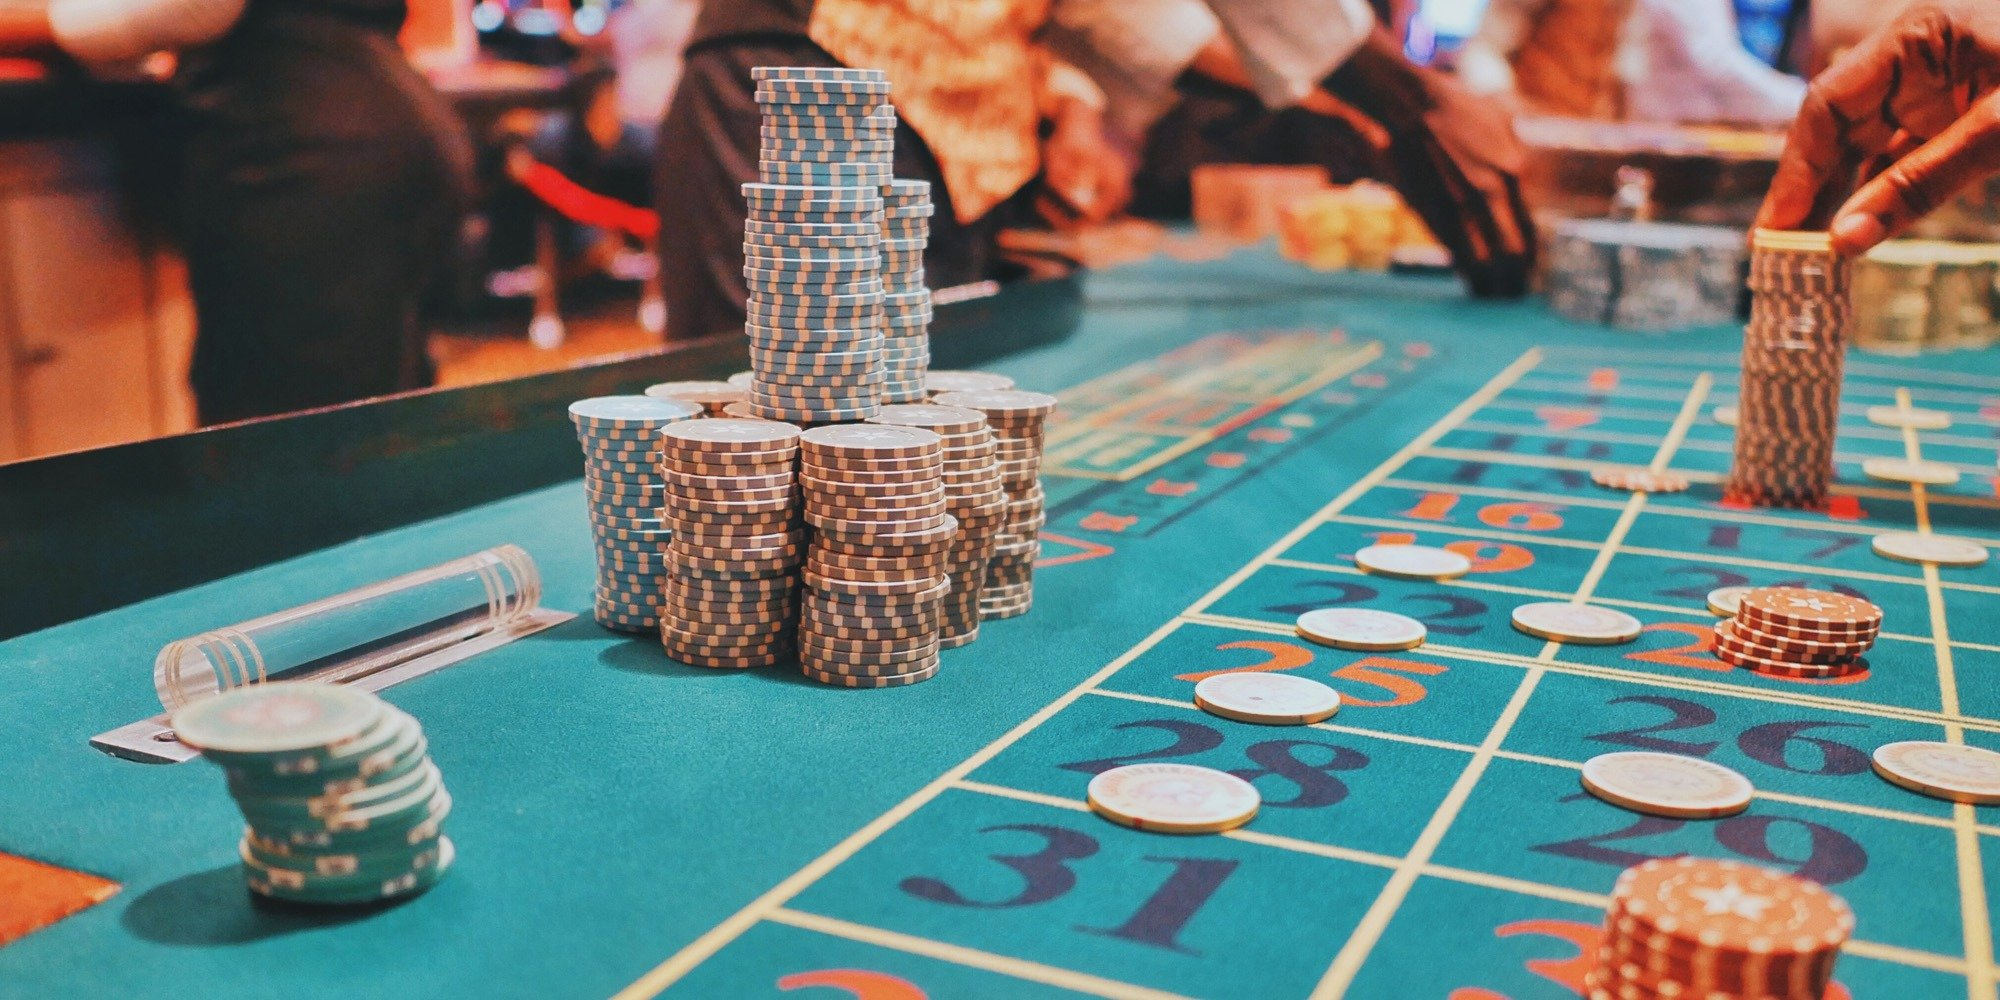 video monitors casino security services Puerto Rico